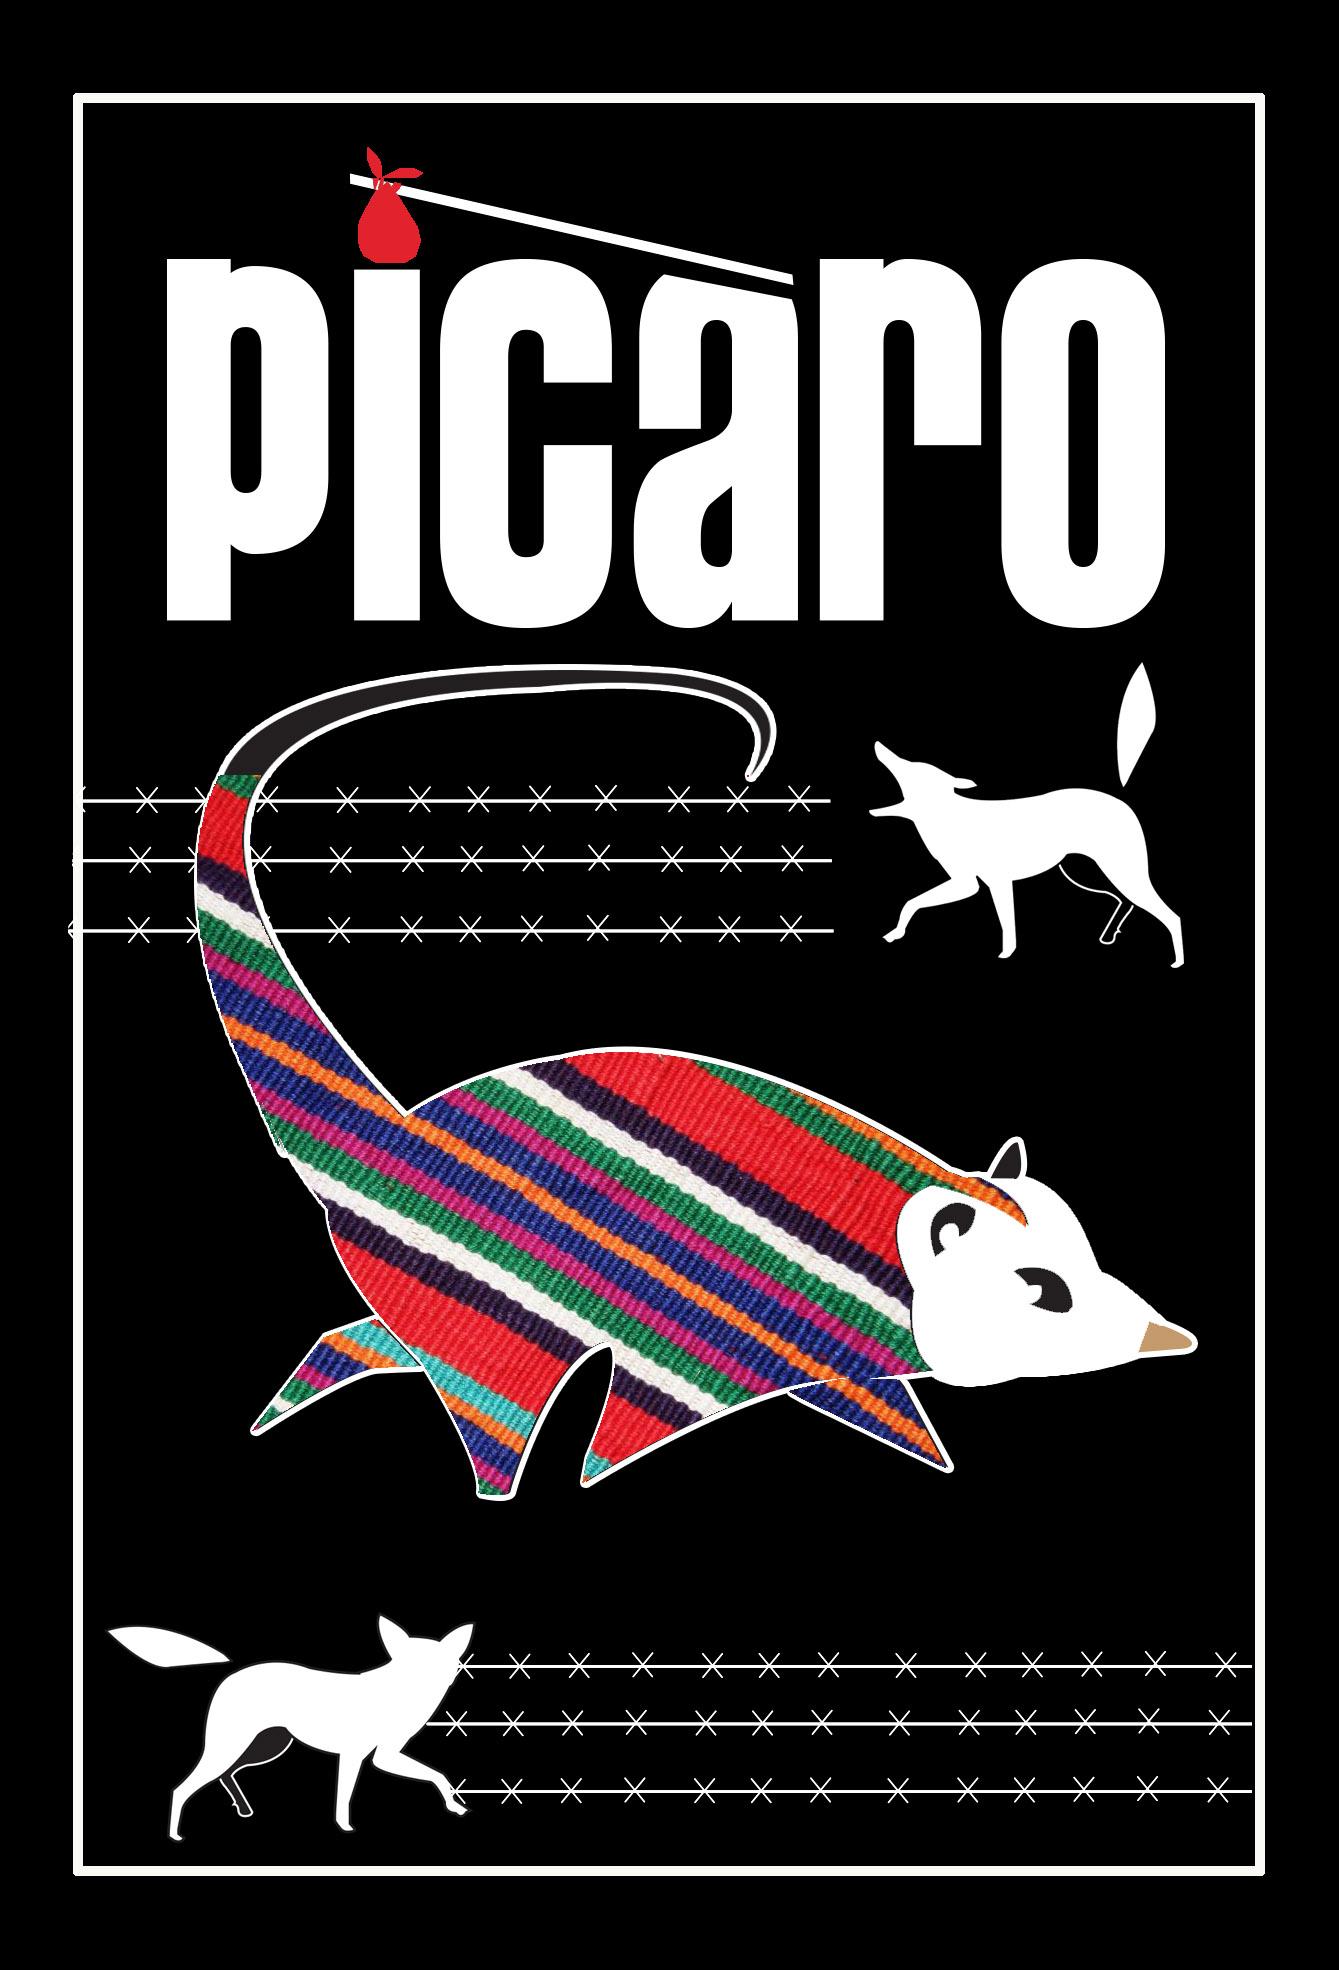 picaro_blk.jpg